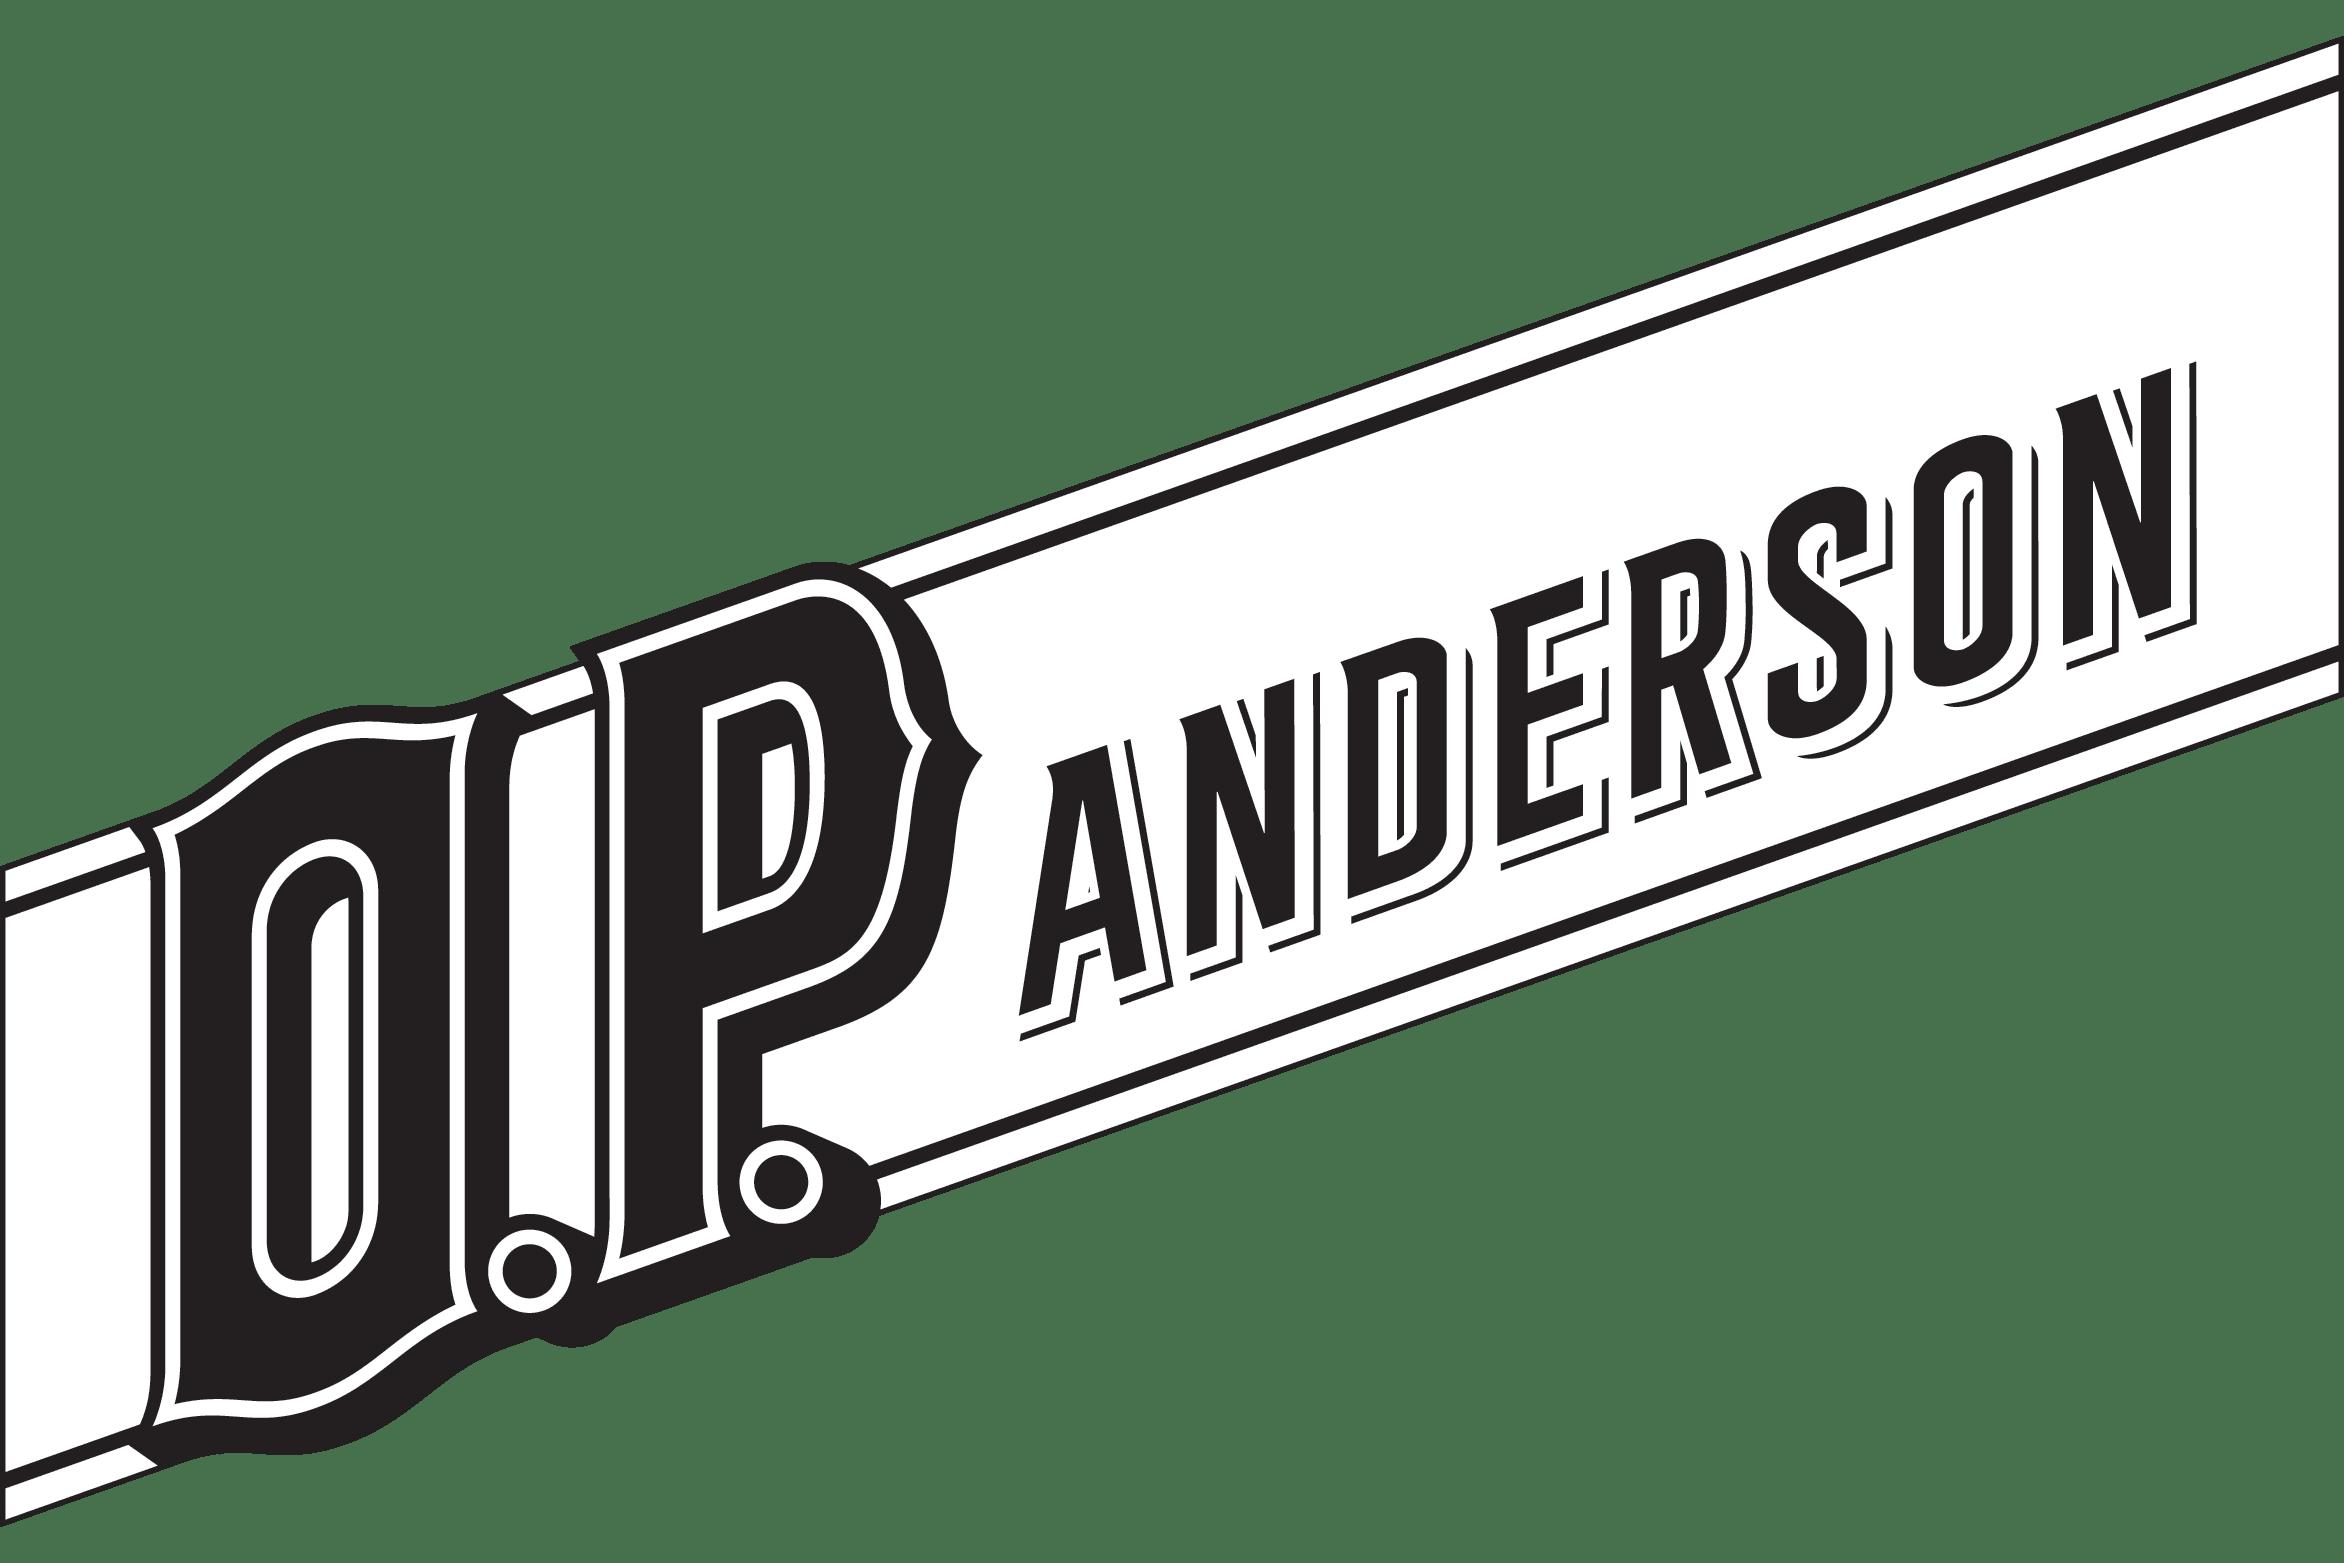 O.P Anderson white logo